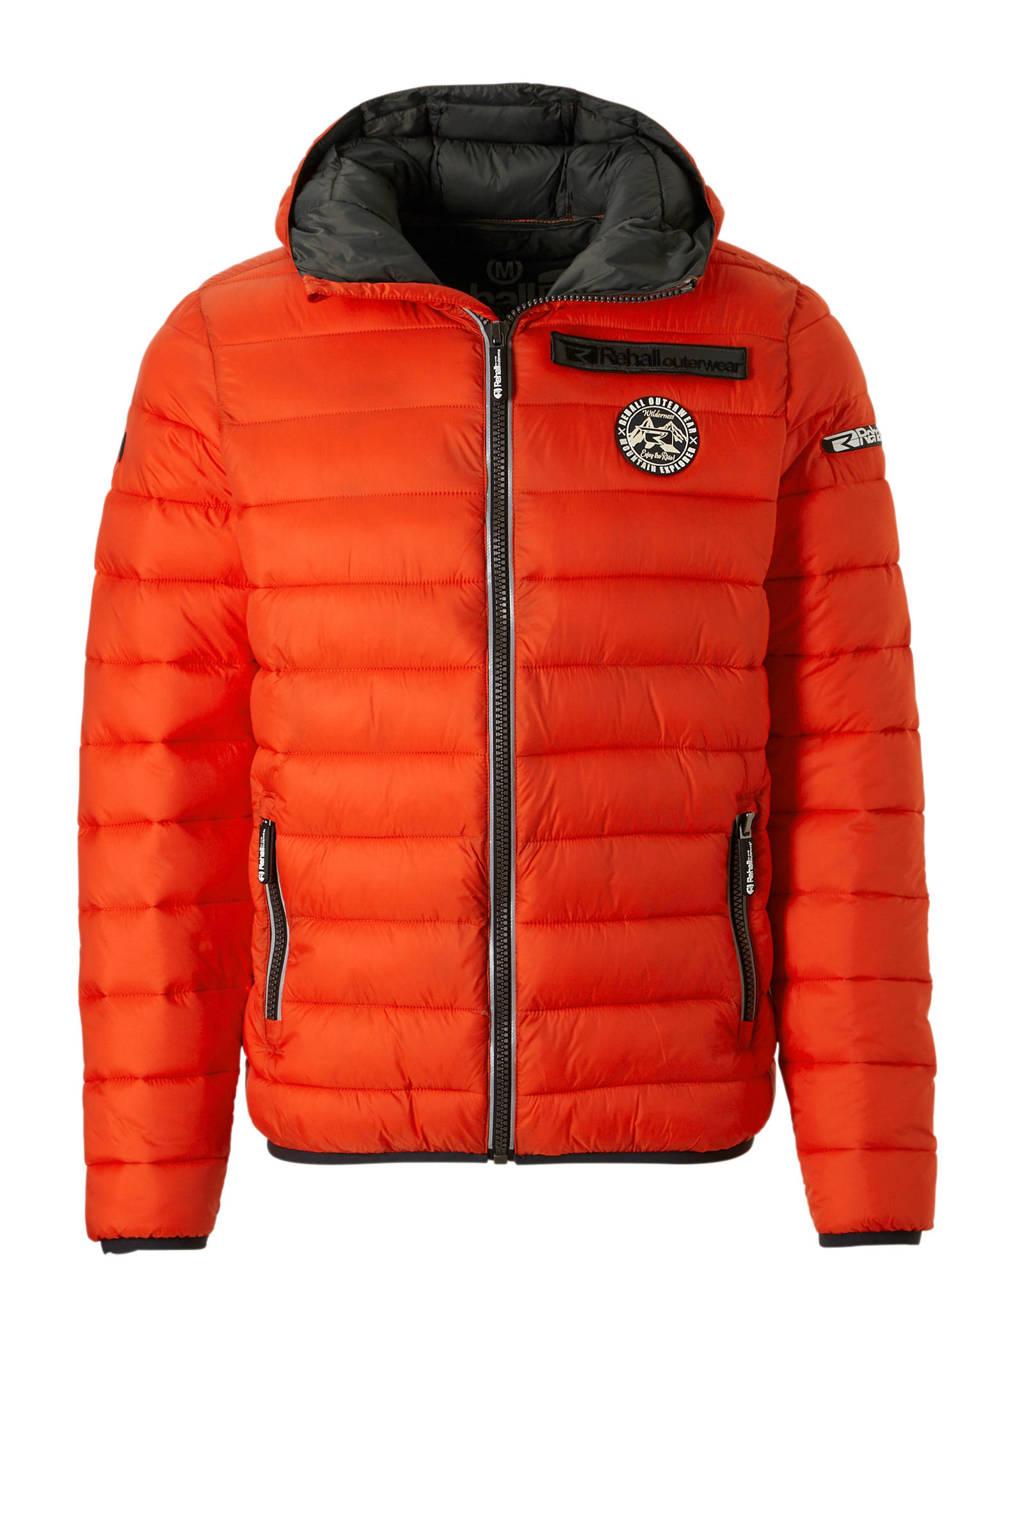 Rehall jack Finn-R oranje, Oranje/donkerblauw